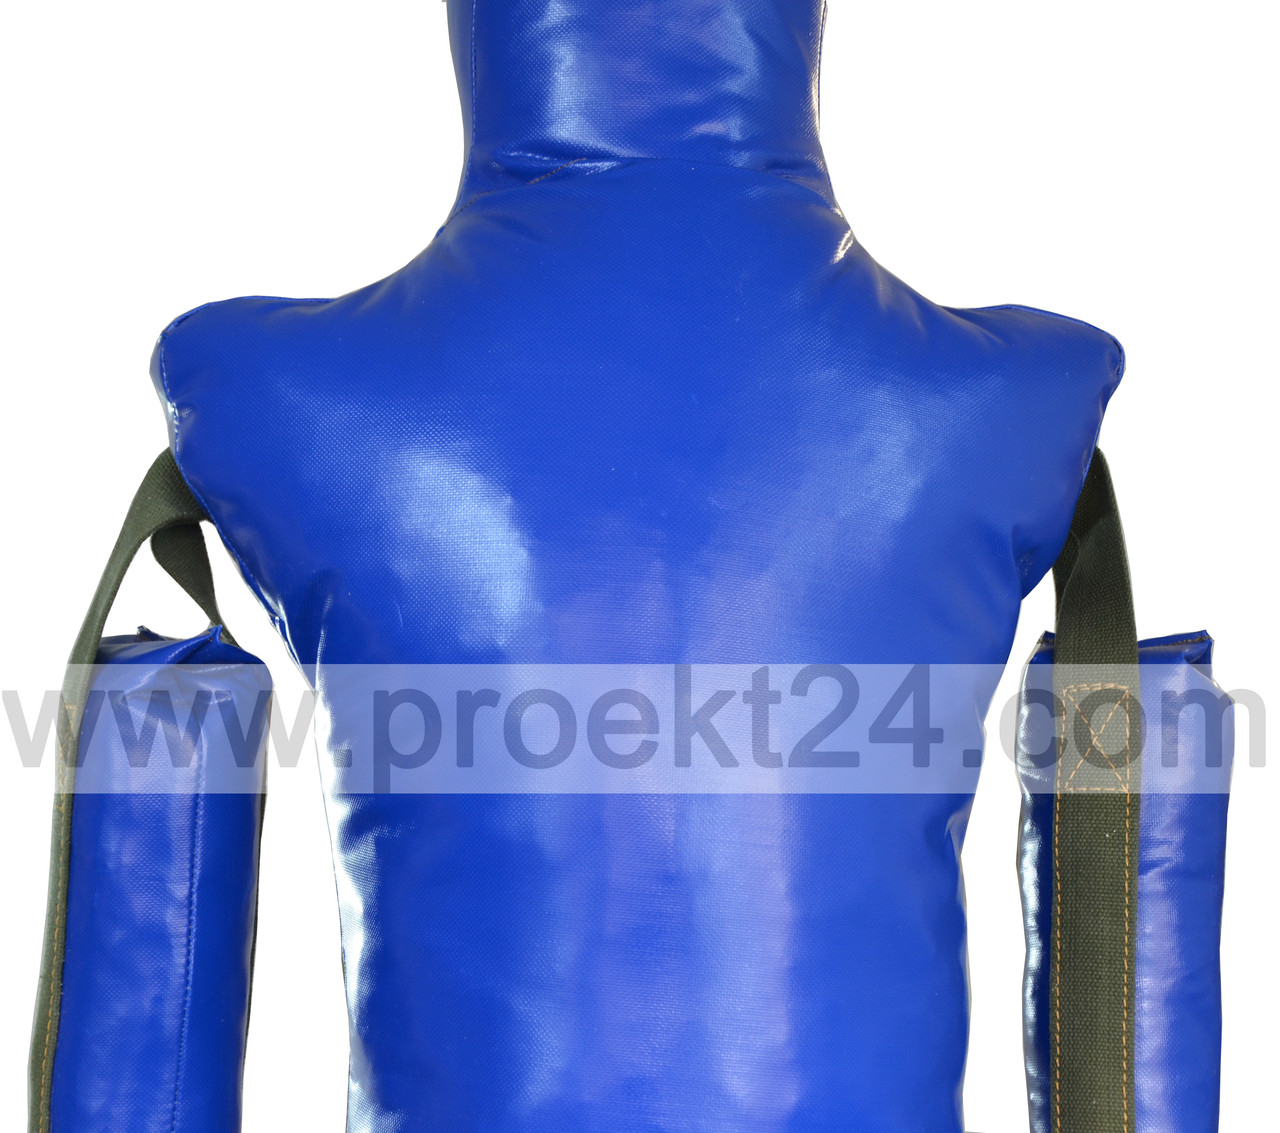 Манекен для борьбы, борцовский манекен 120см. (1 нога, руки вниз)